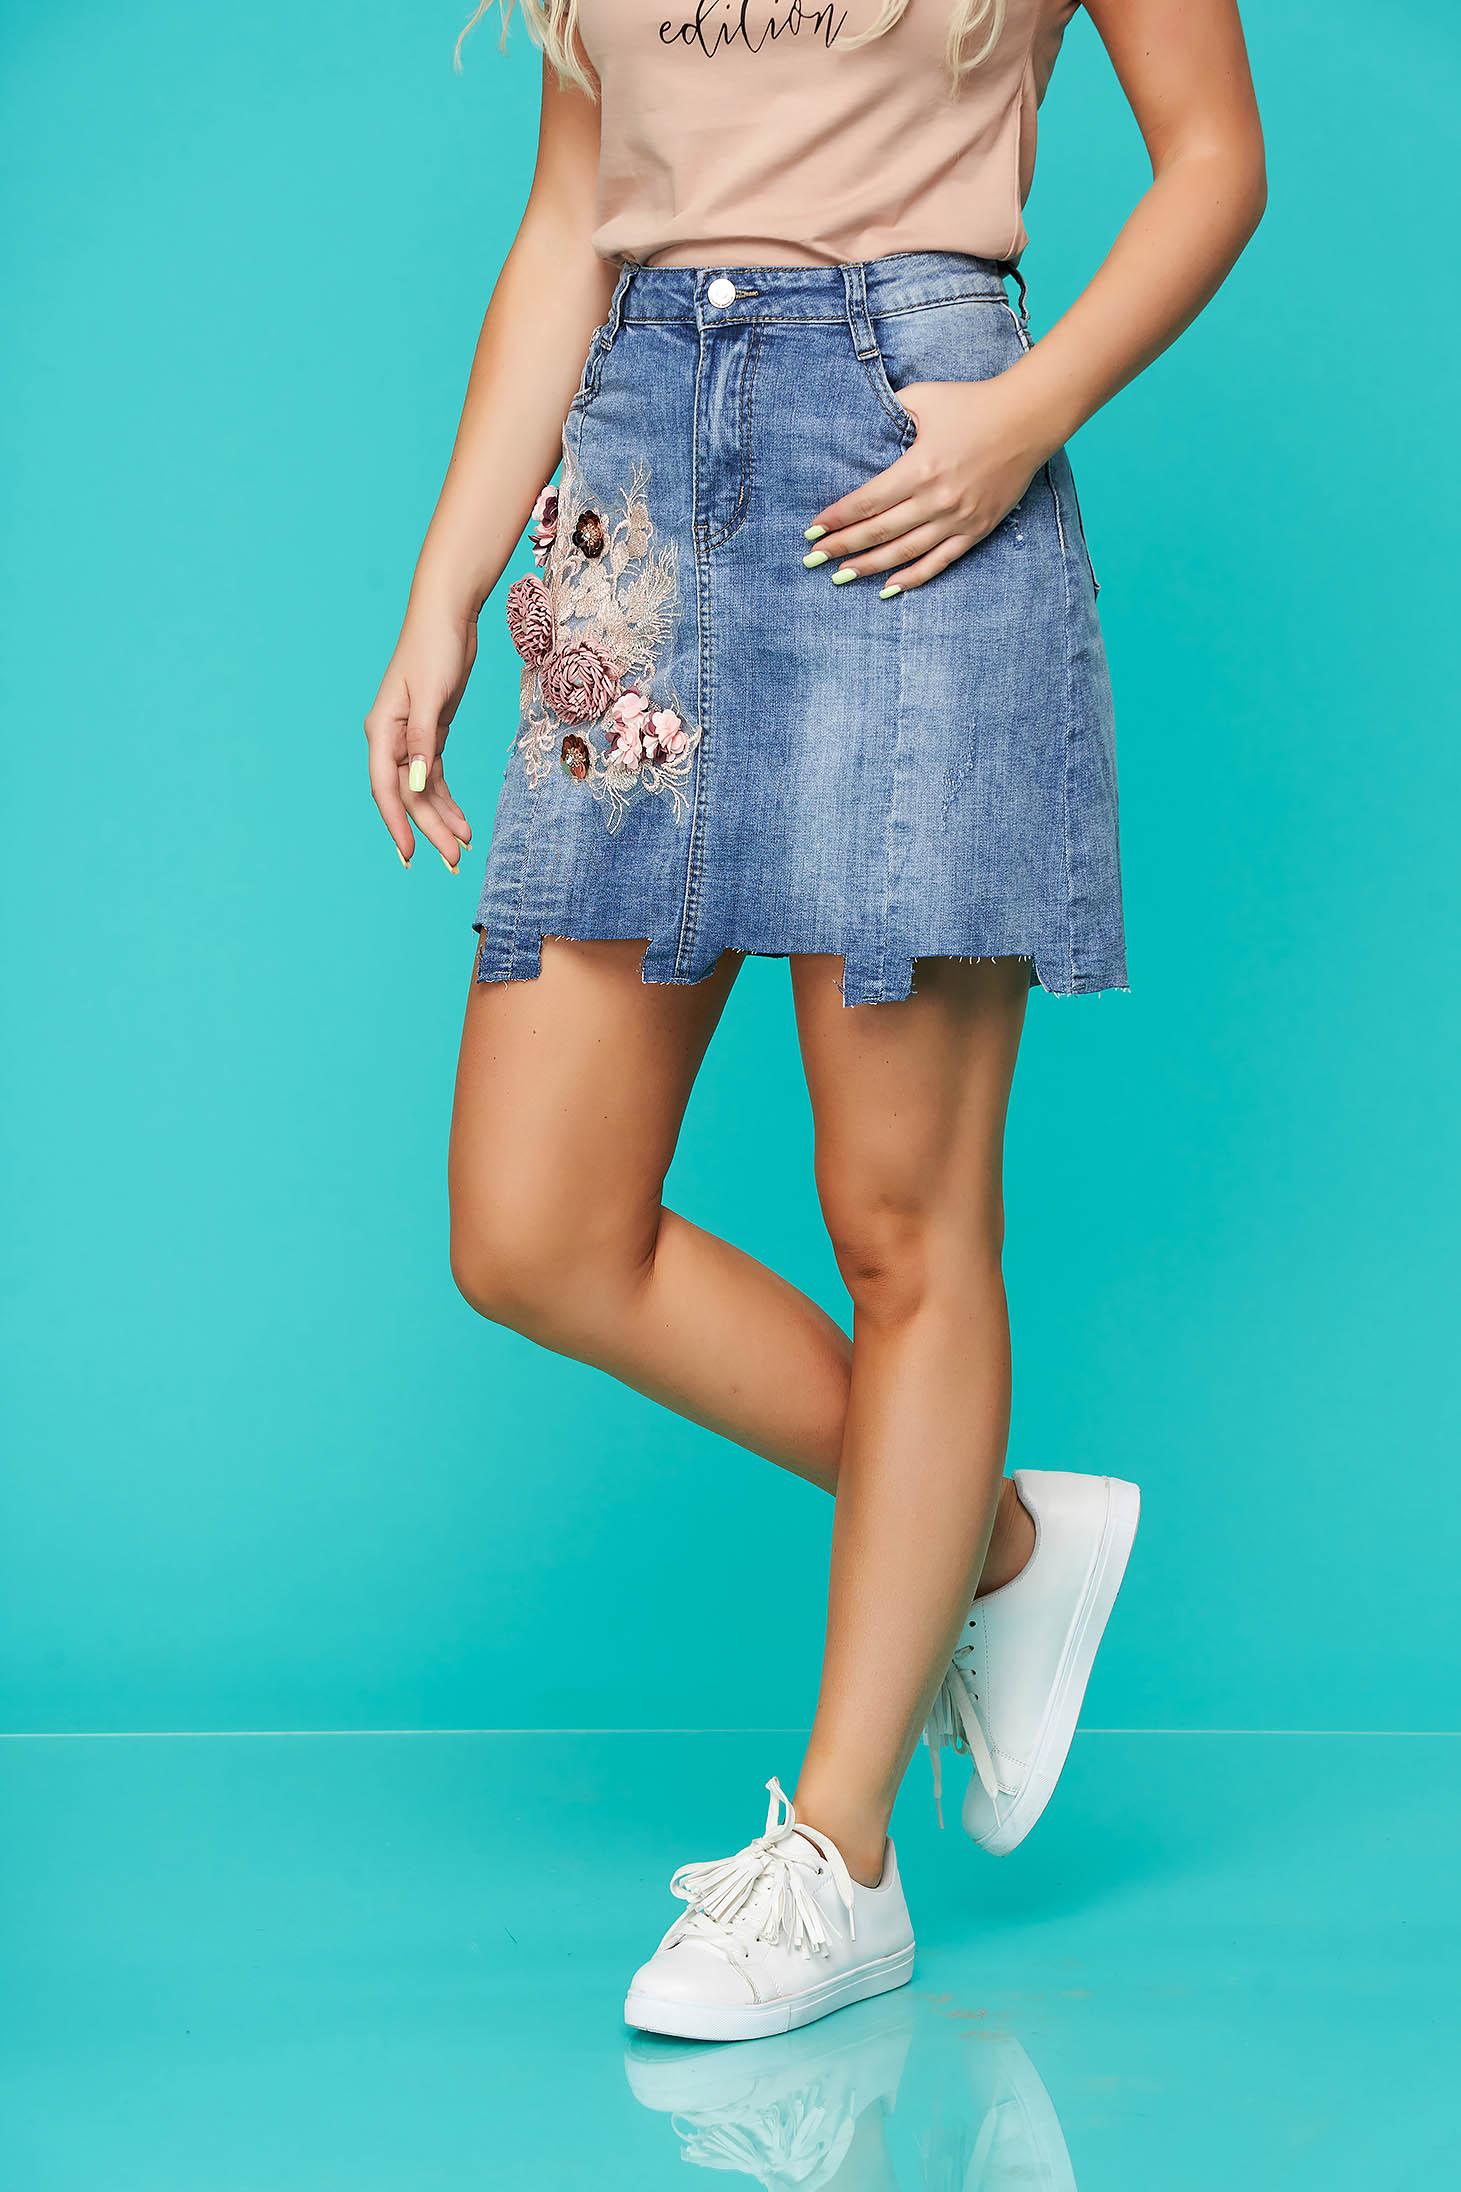 Fusta SunShine albastra casual din denim cu un croi drept cu imprimeu floral si accesoriu inclus